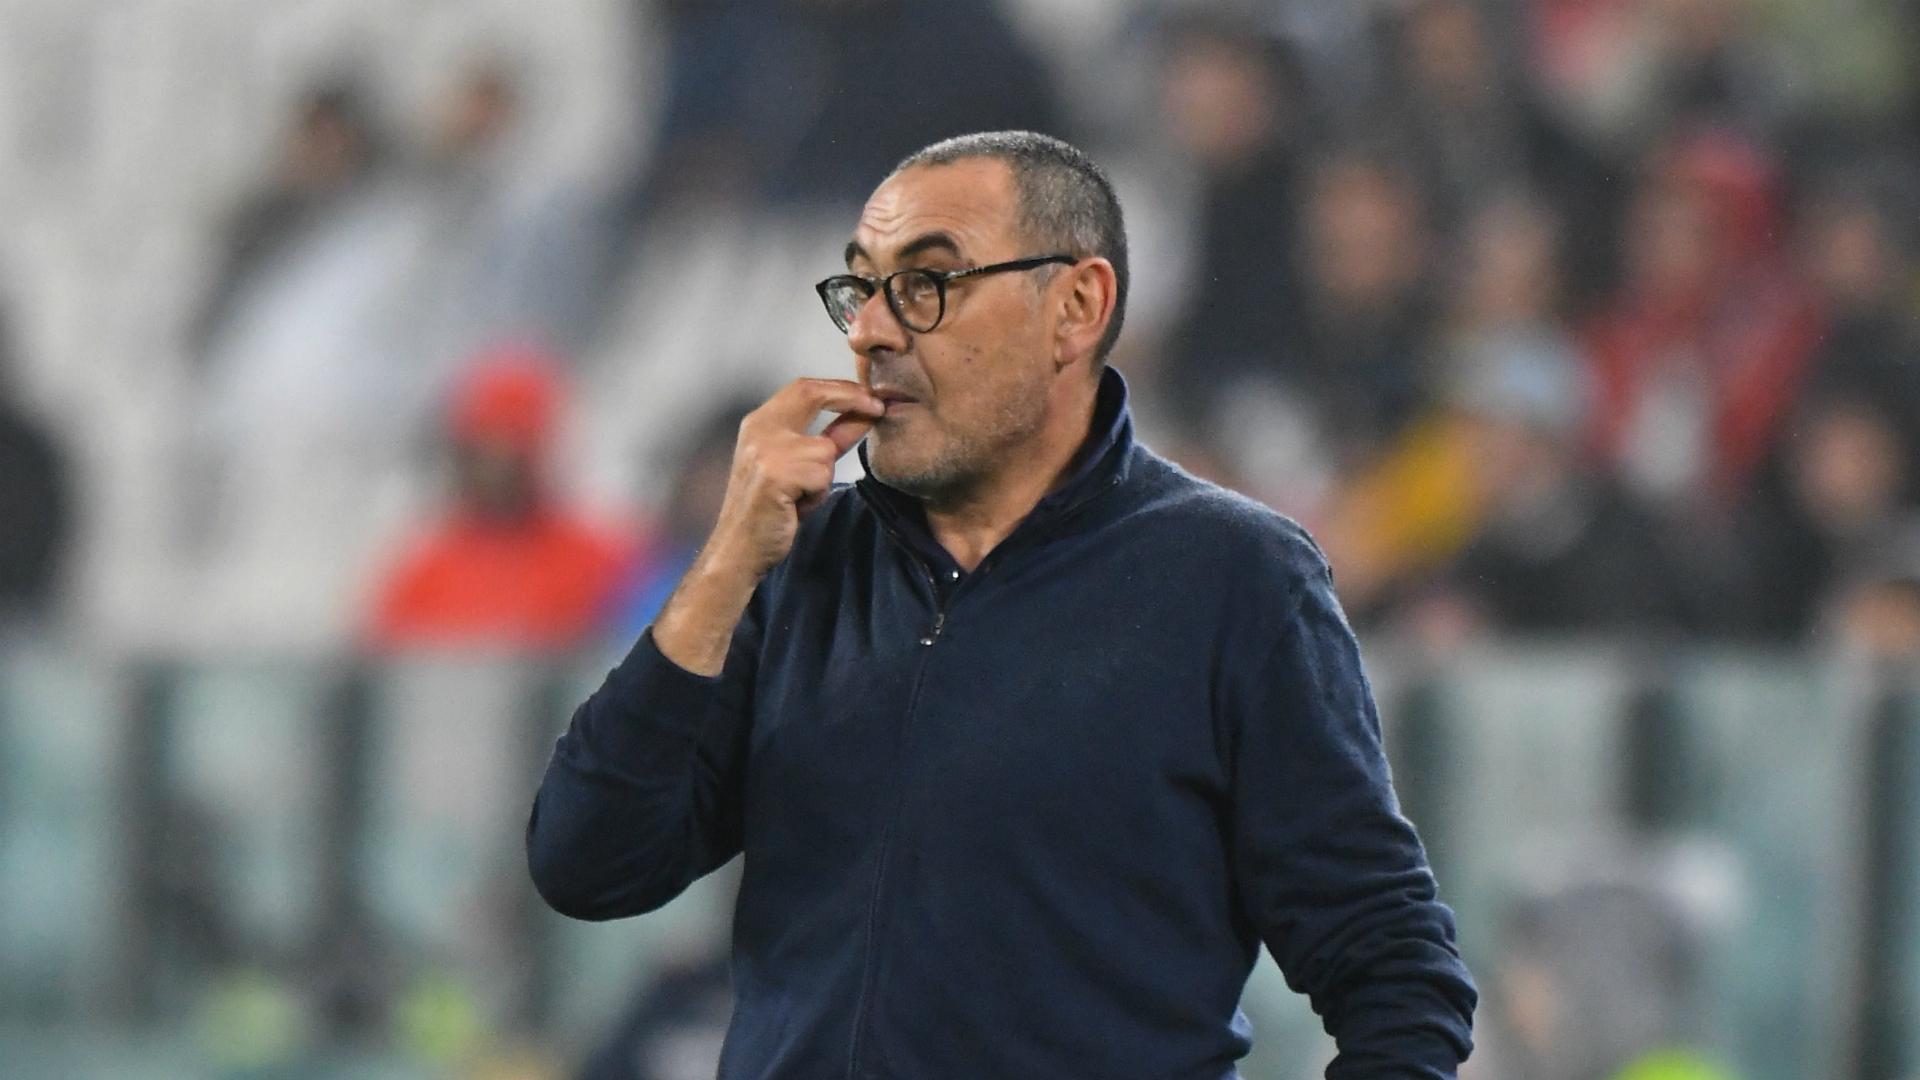 Juventus must be better than last season to retain title – Sarri